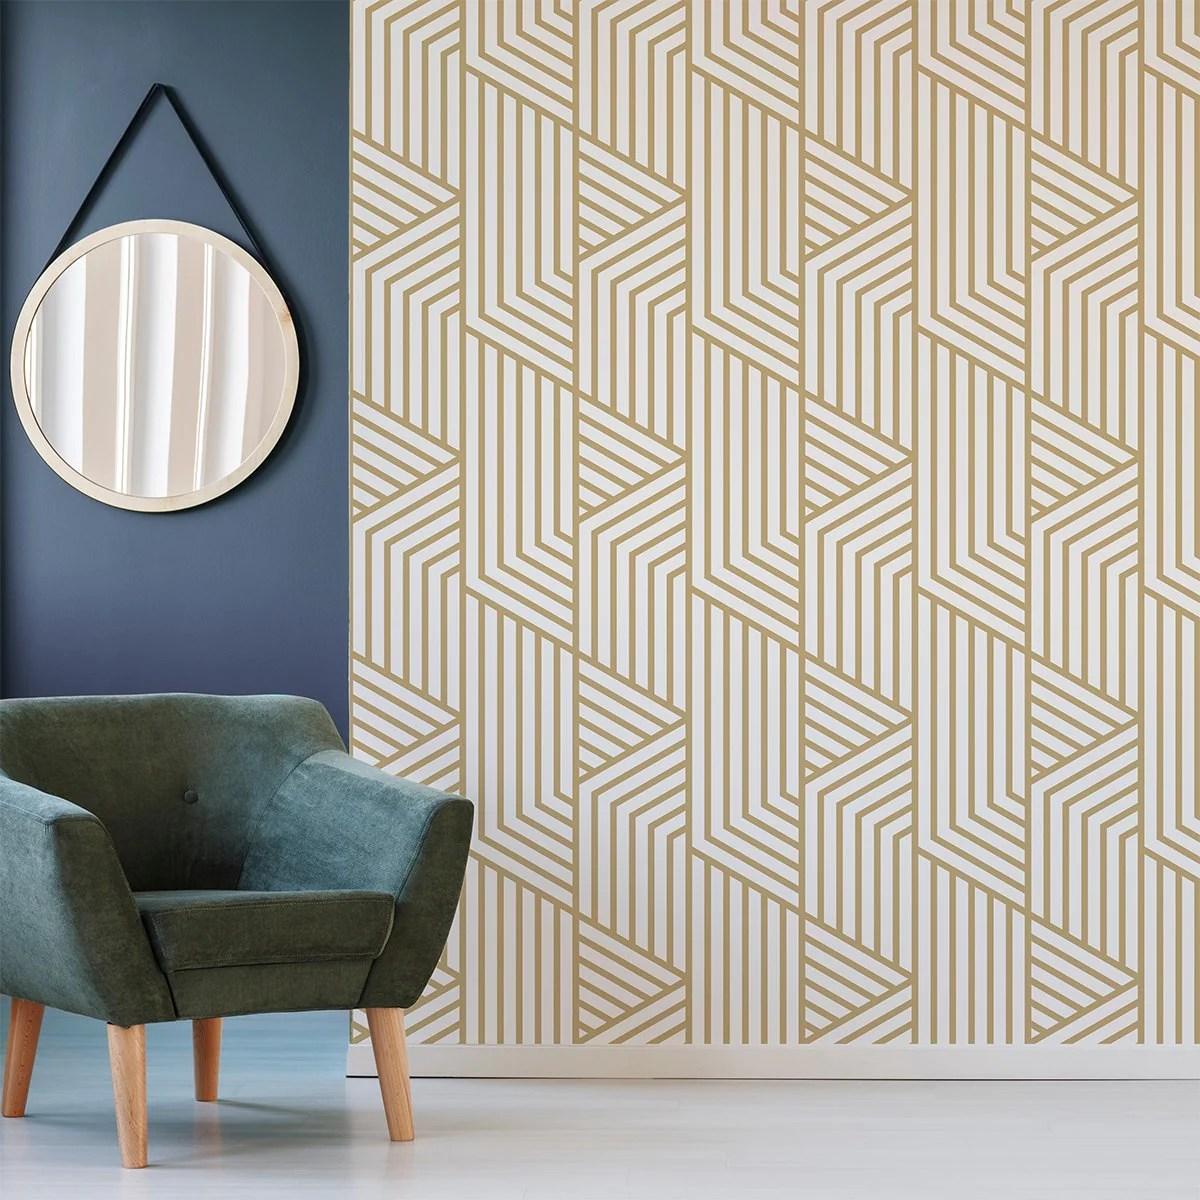 Gold Art Deco Wallpaper Mural Removable Wallpaper Free Uk Shipping Www Wallpapermural Com